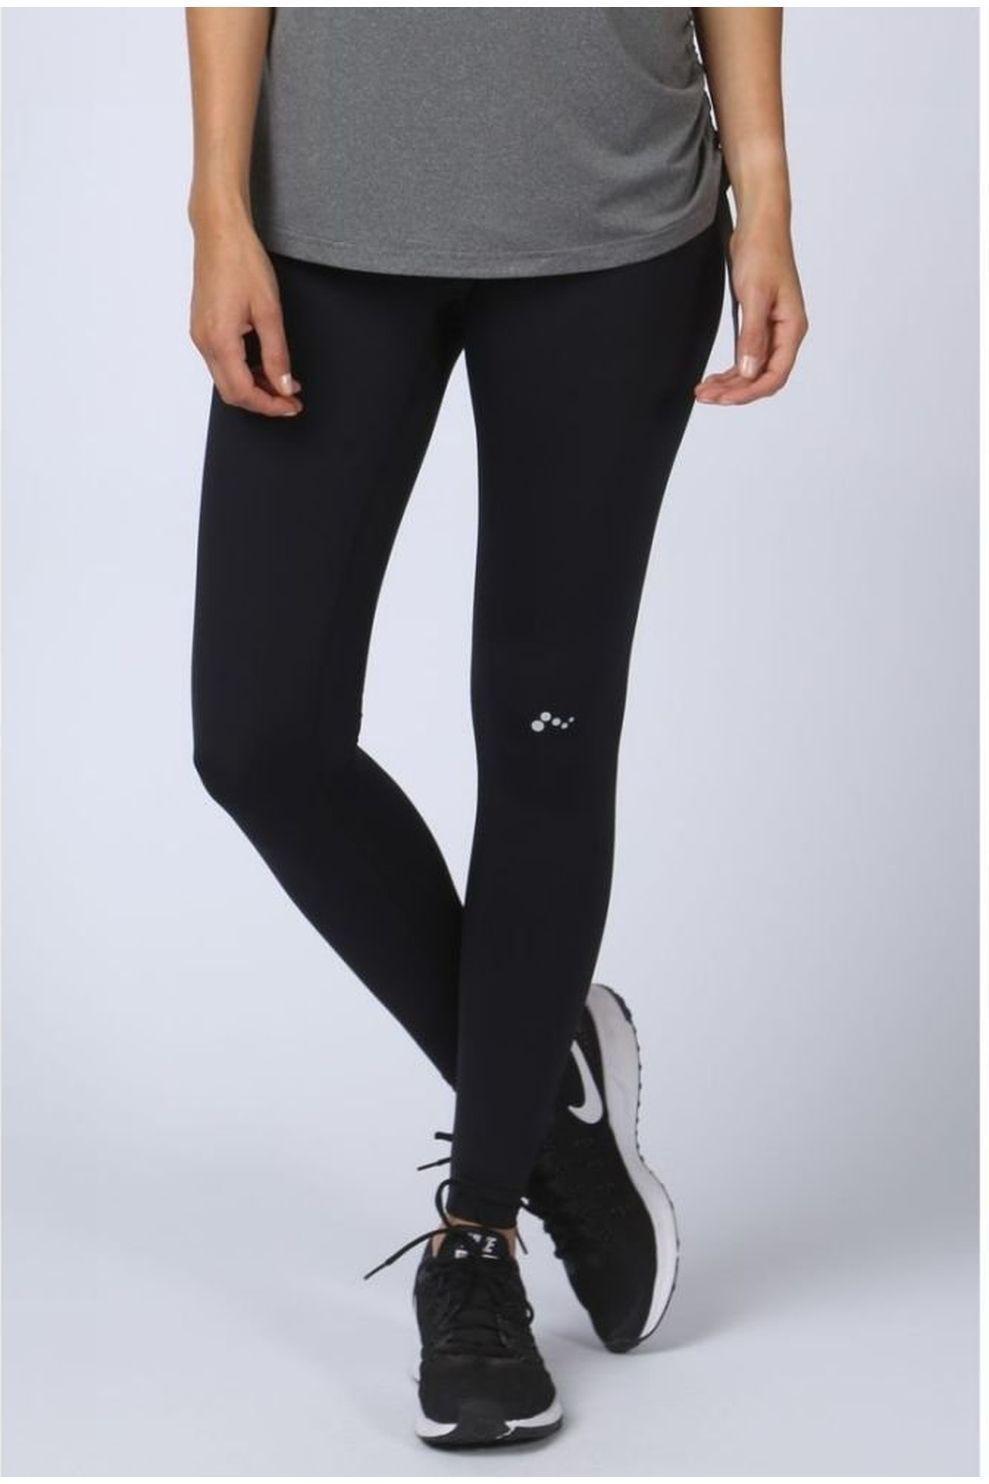 Only Play Legging Fast Shape Up Training voor dames - Zwart - Maten: XS, S, M, L, XL